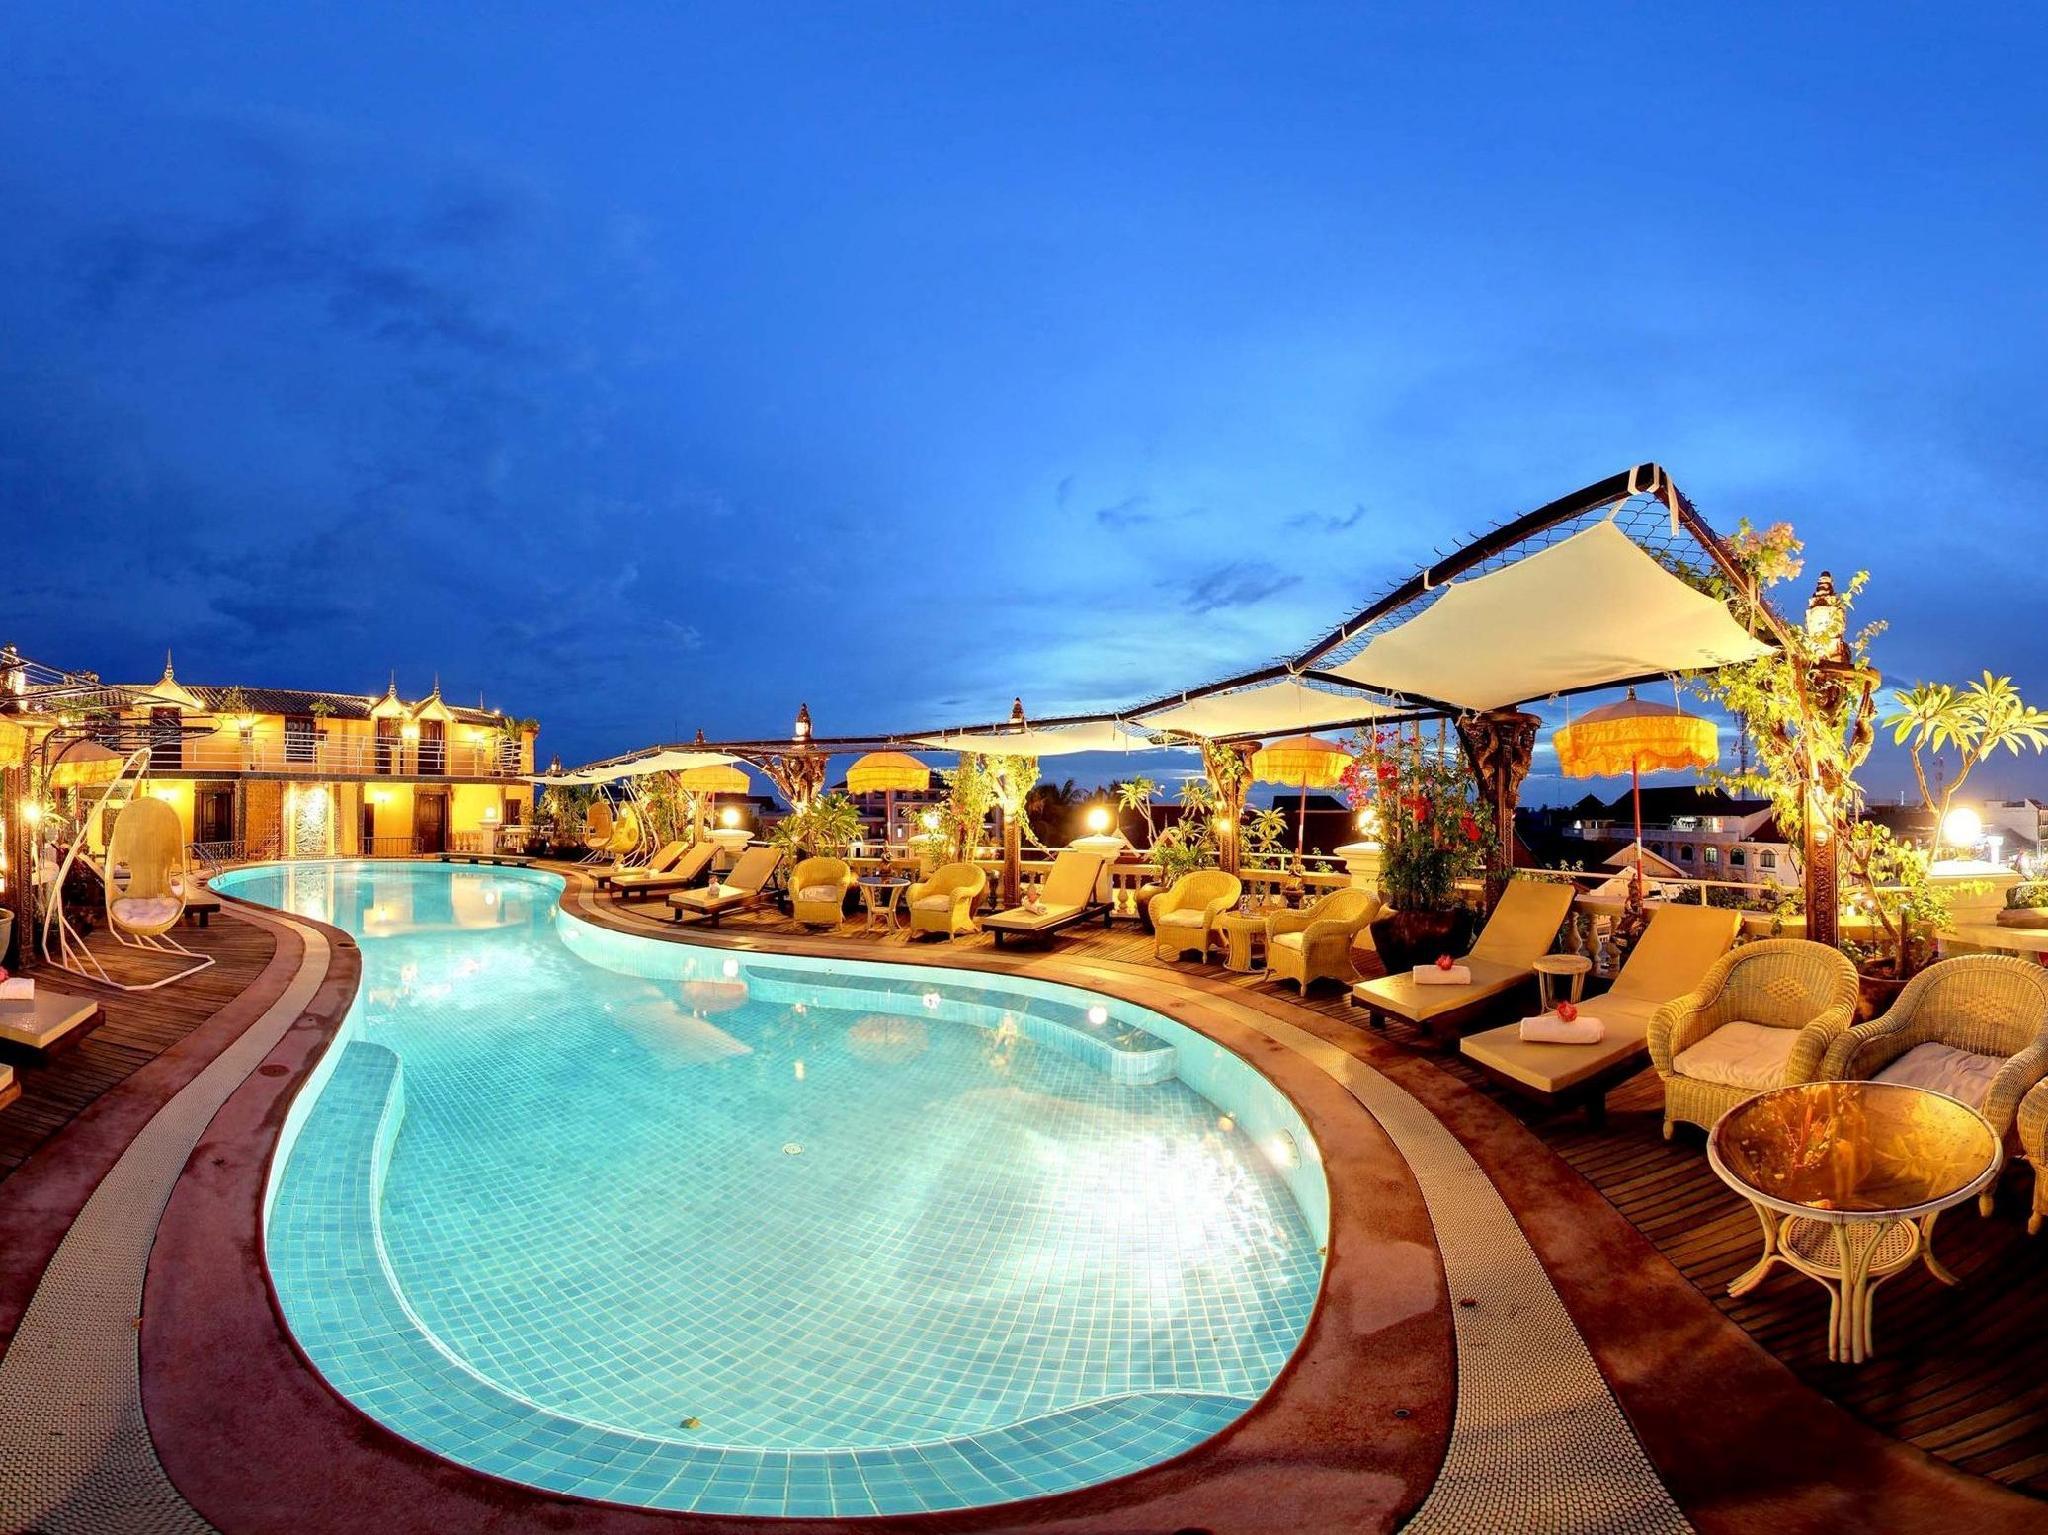 Terrasse des Elephants Hotel & Restaurant Siem Reap